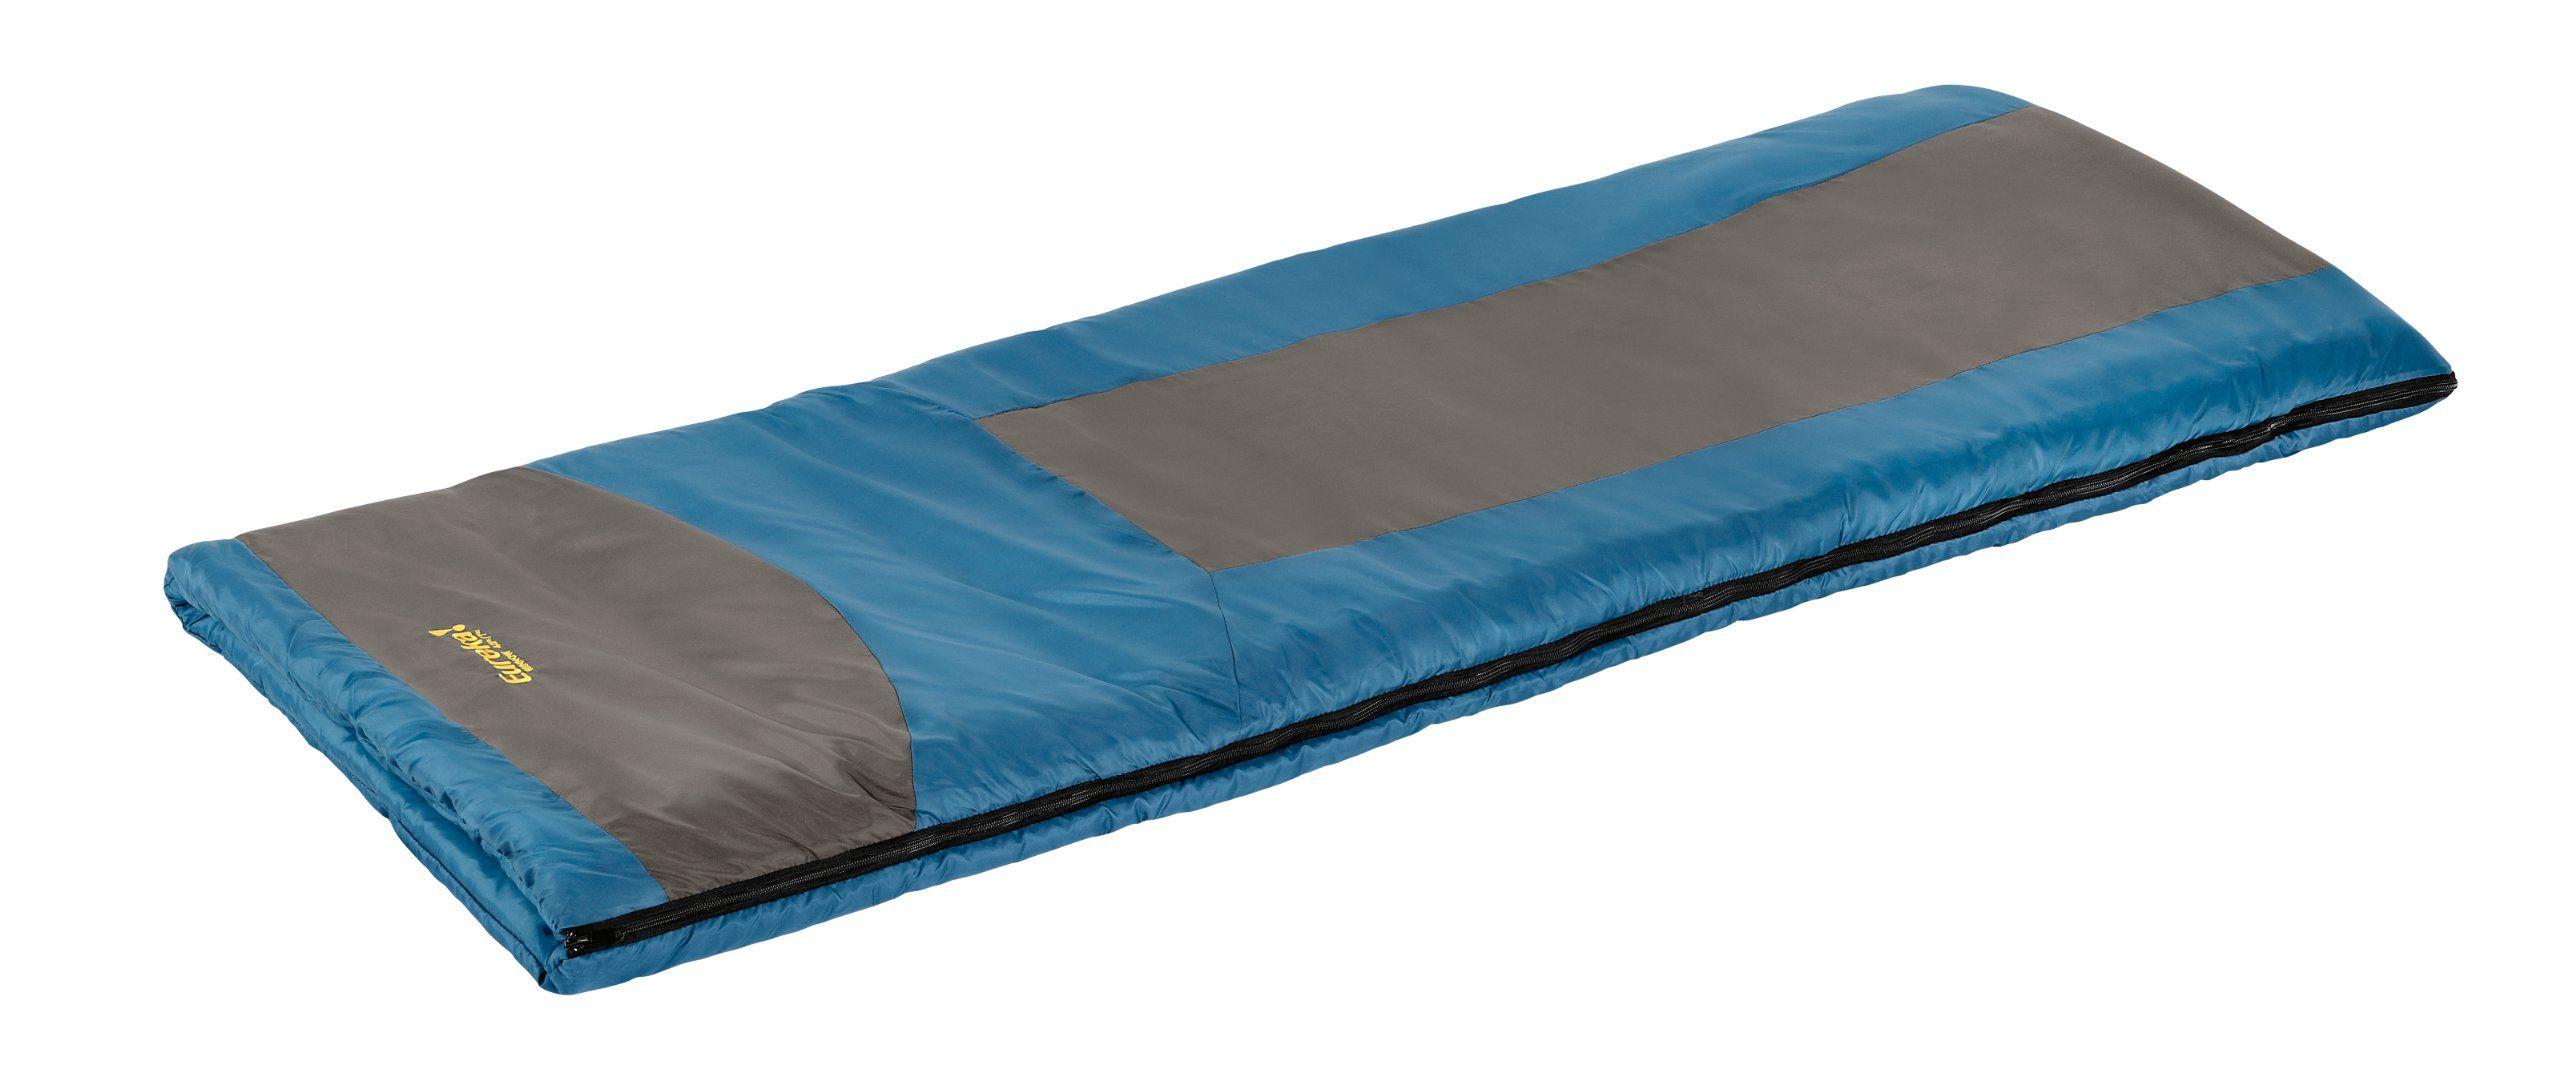 Minnow 45 Degree Childrens Rectangular Sleeping Bag Comfortable Lightweight Three Season